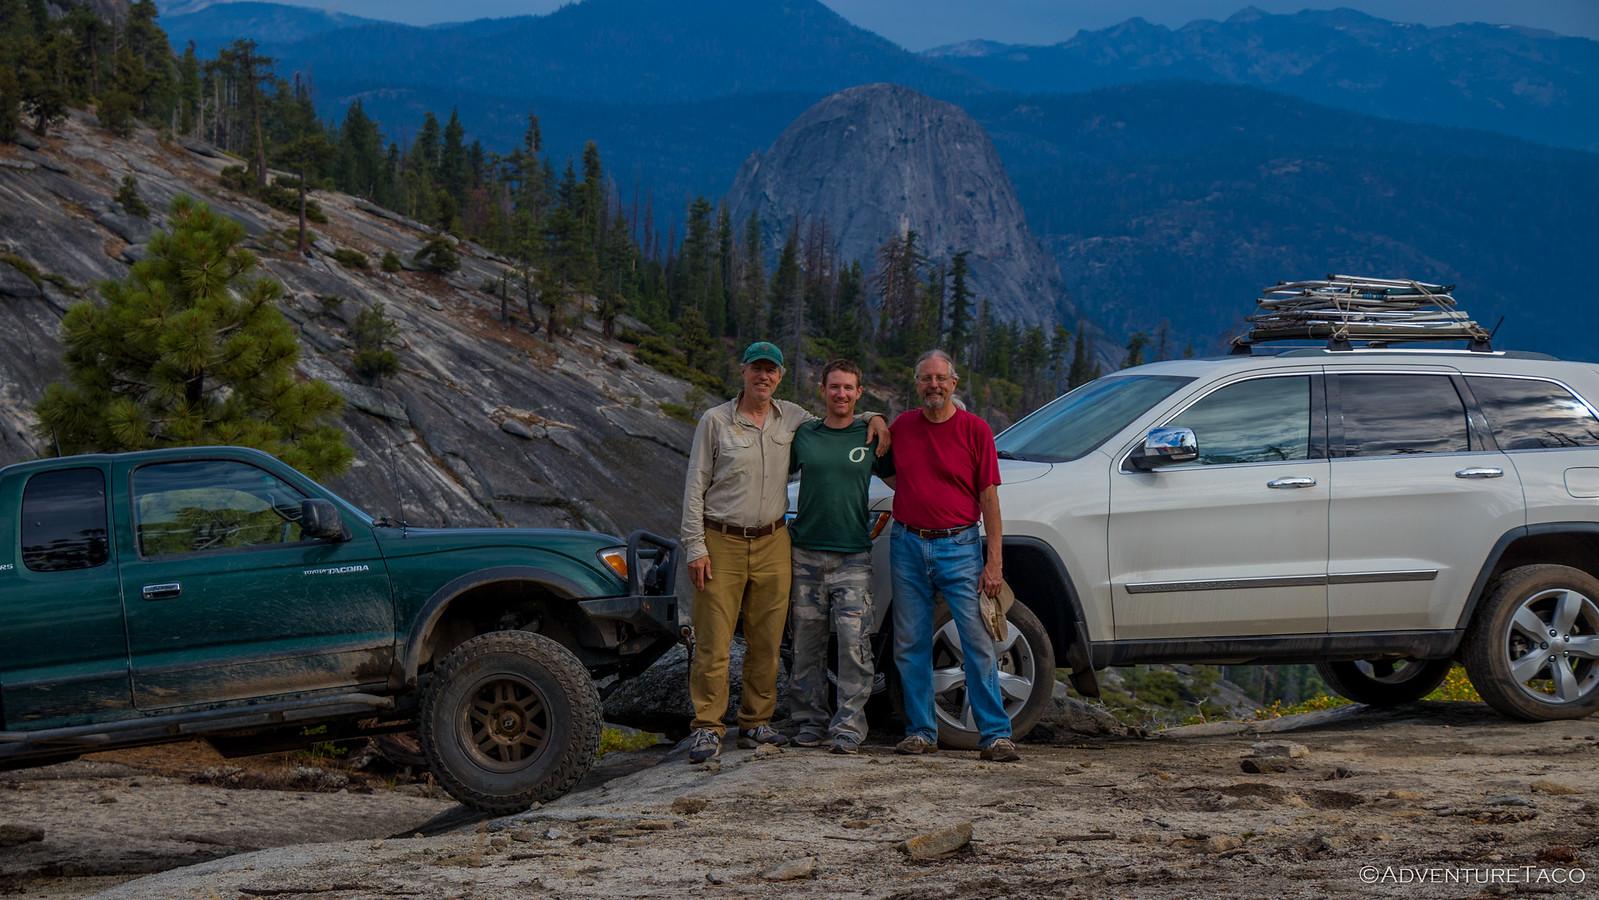 Sierras Part 4: The Incident